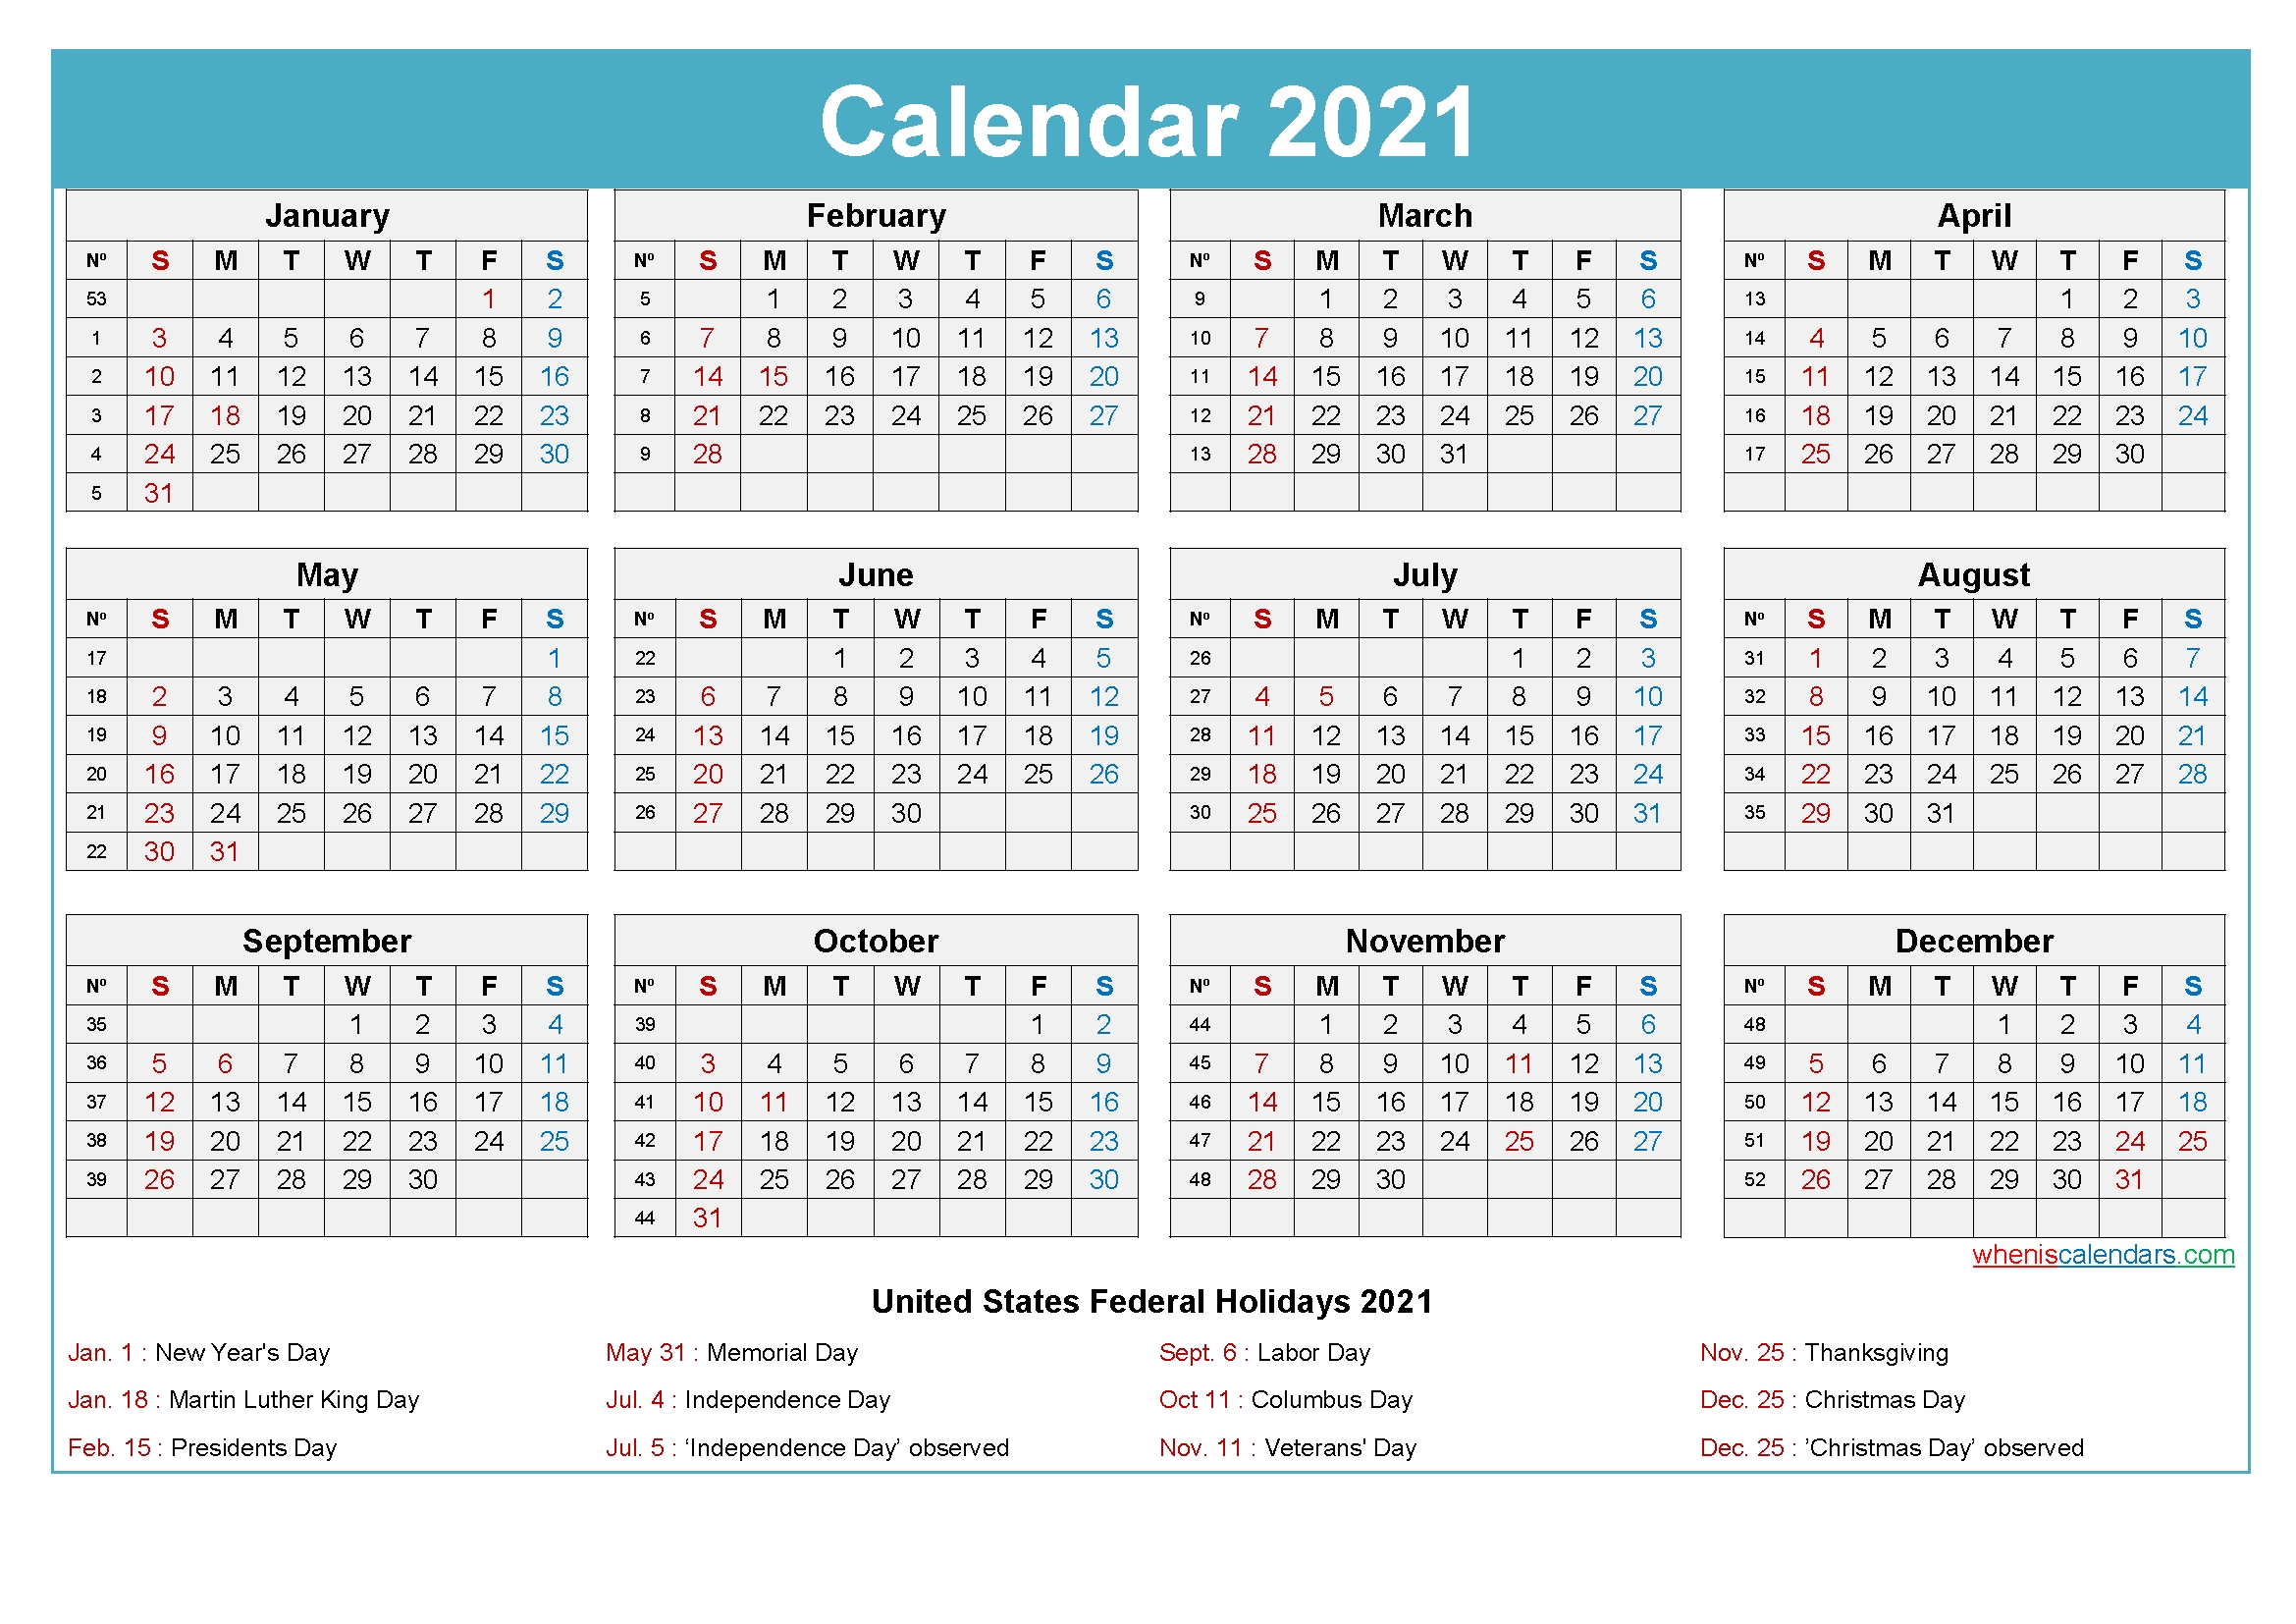 2021 Calendar With Holidays Printable Word, Pdf - Free Printable 2020 Monthly Calendar With Holidays